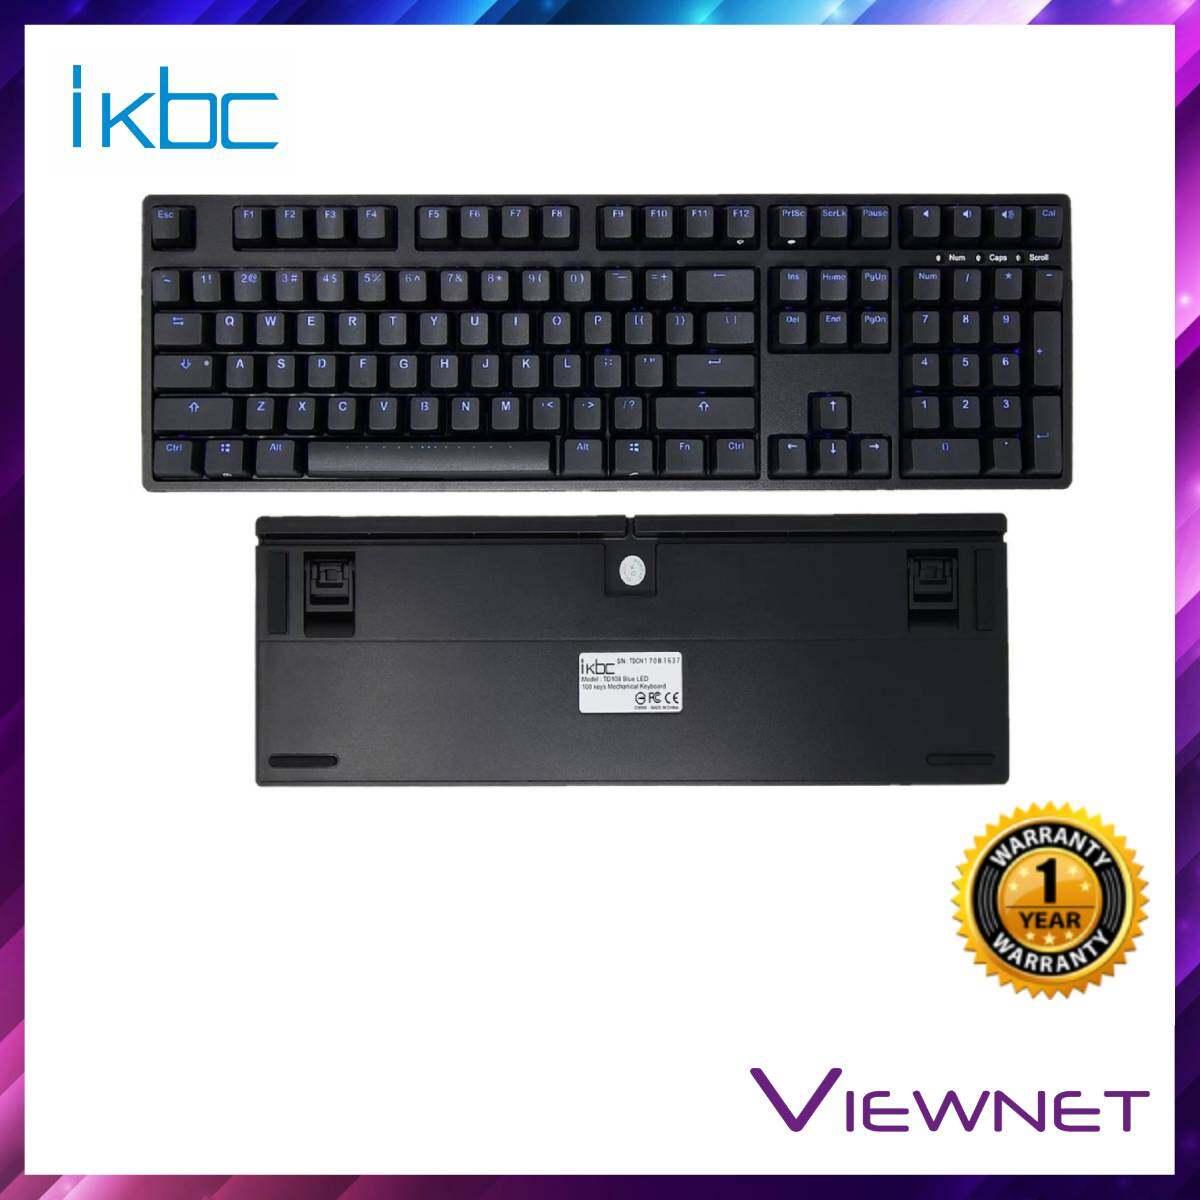 IKBC Gaming Wired TD108 (Brown/Blue/Red Switch) Black Keyboard